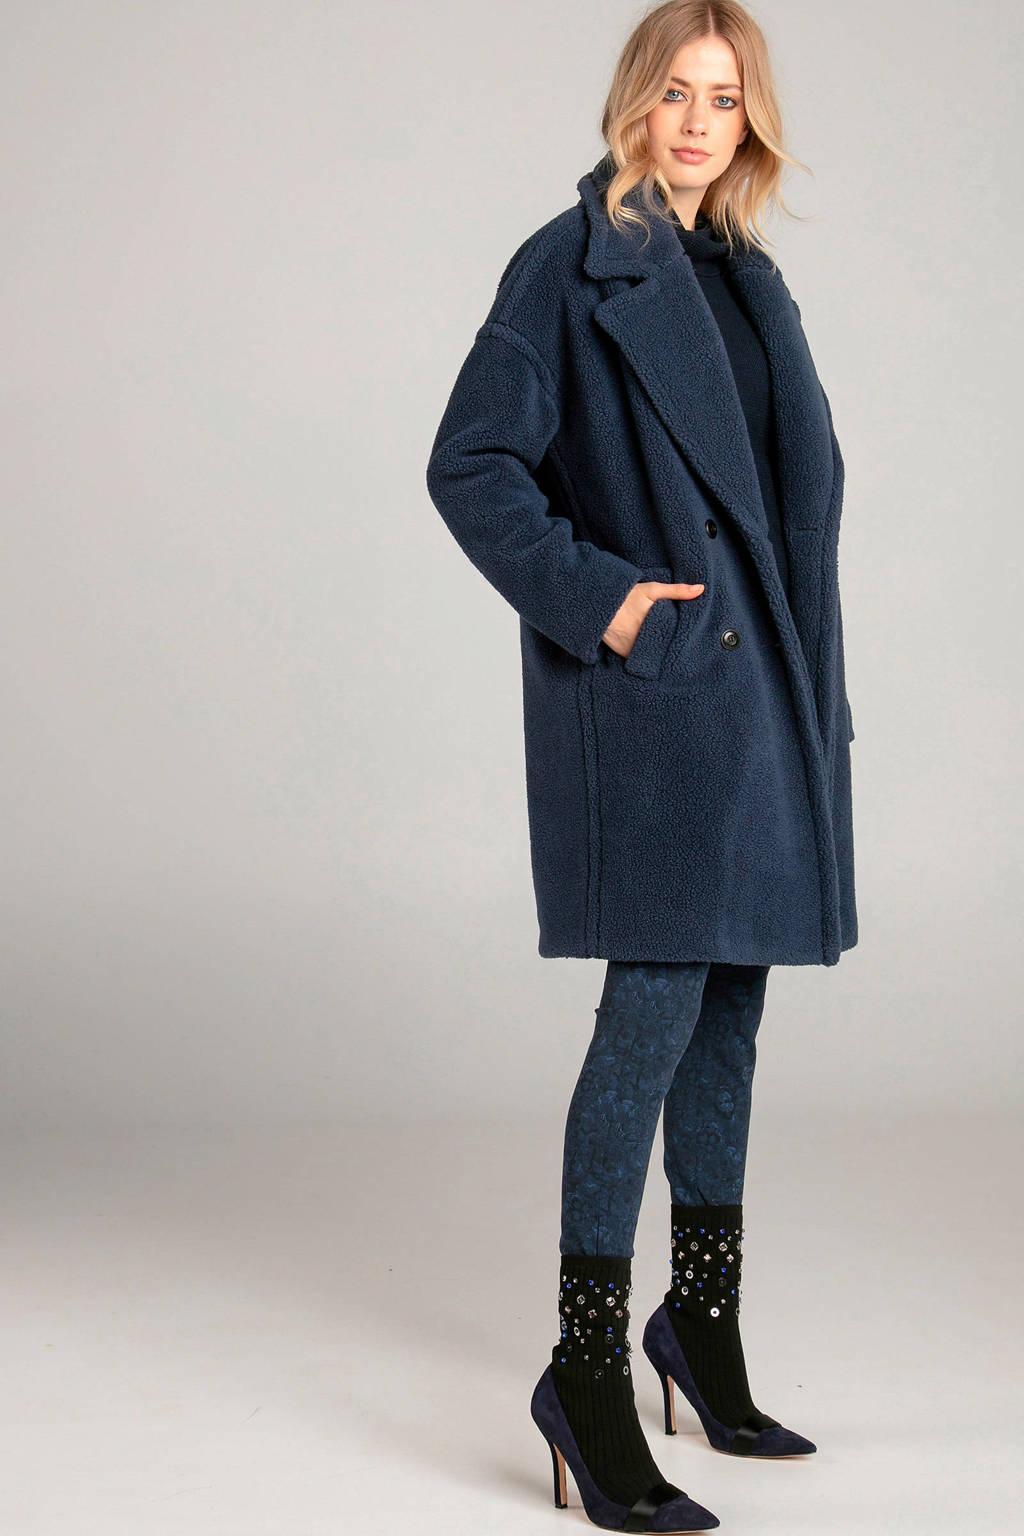 Claudia Sträter gebloemde skinny tregging donkerblauw, Donkerblauw